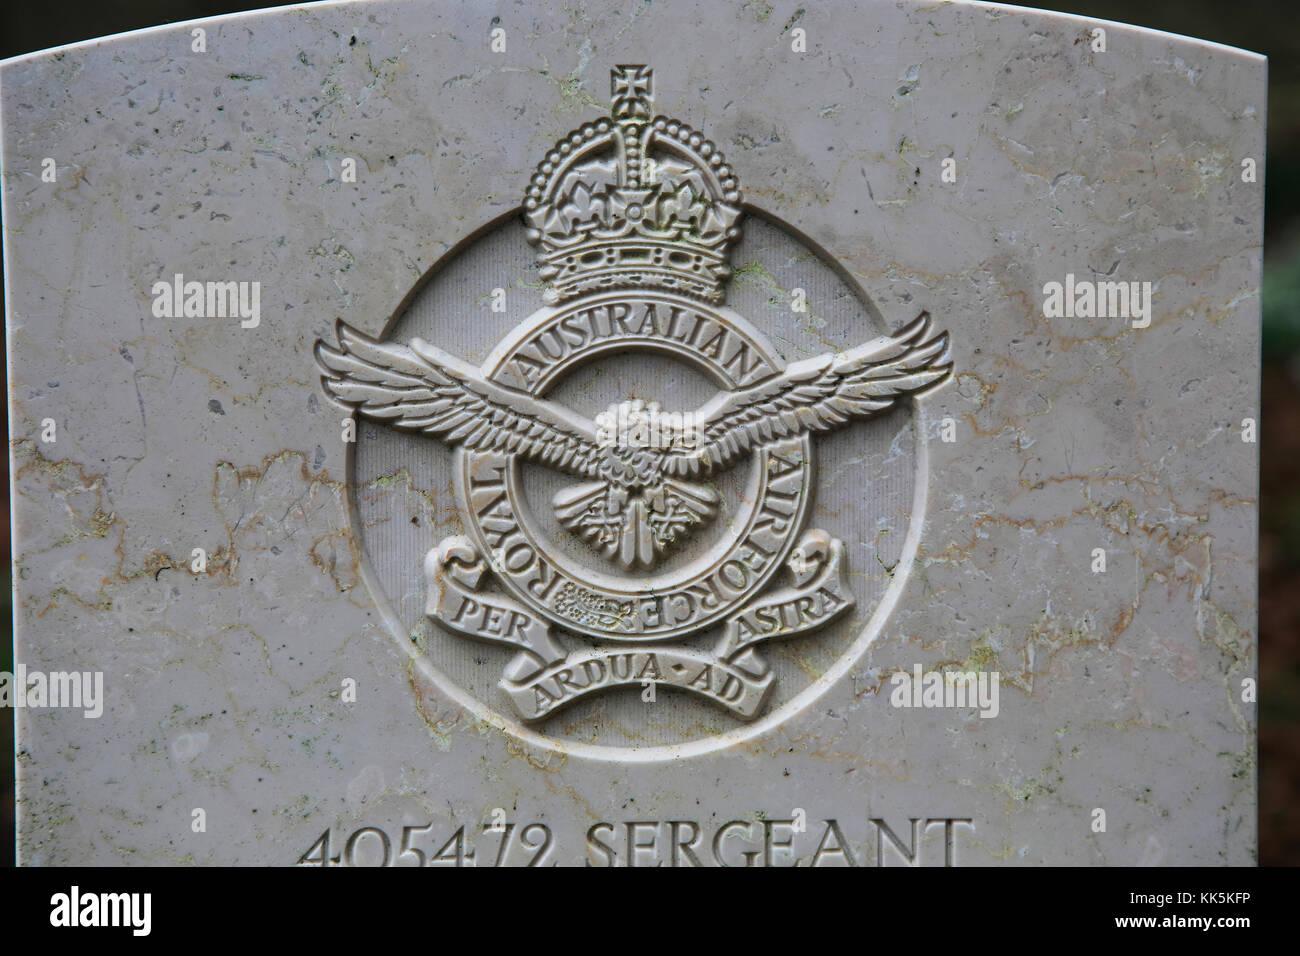 Close up of headstone of serviceman of Australian Royal Airforce, Yatesbury, Wiltshire, England, UK - Stock Image